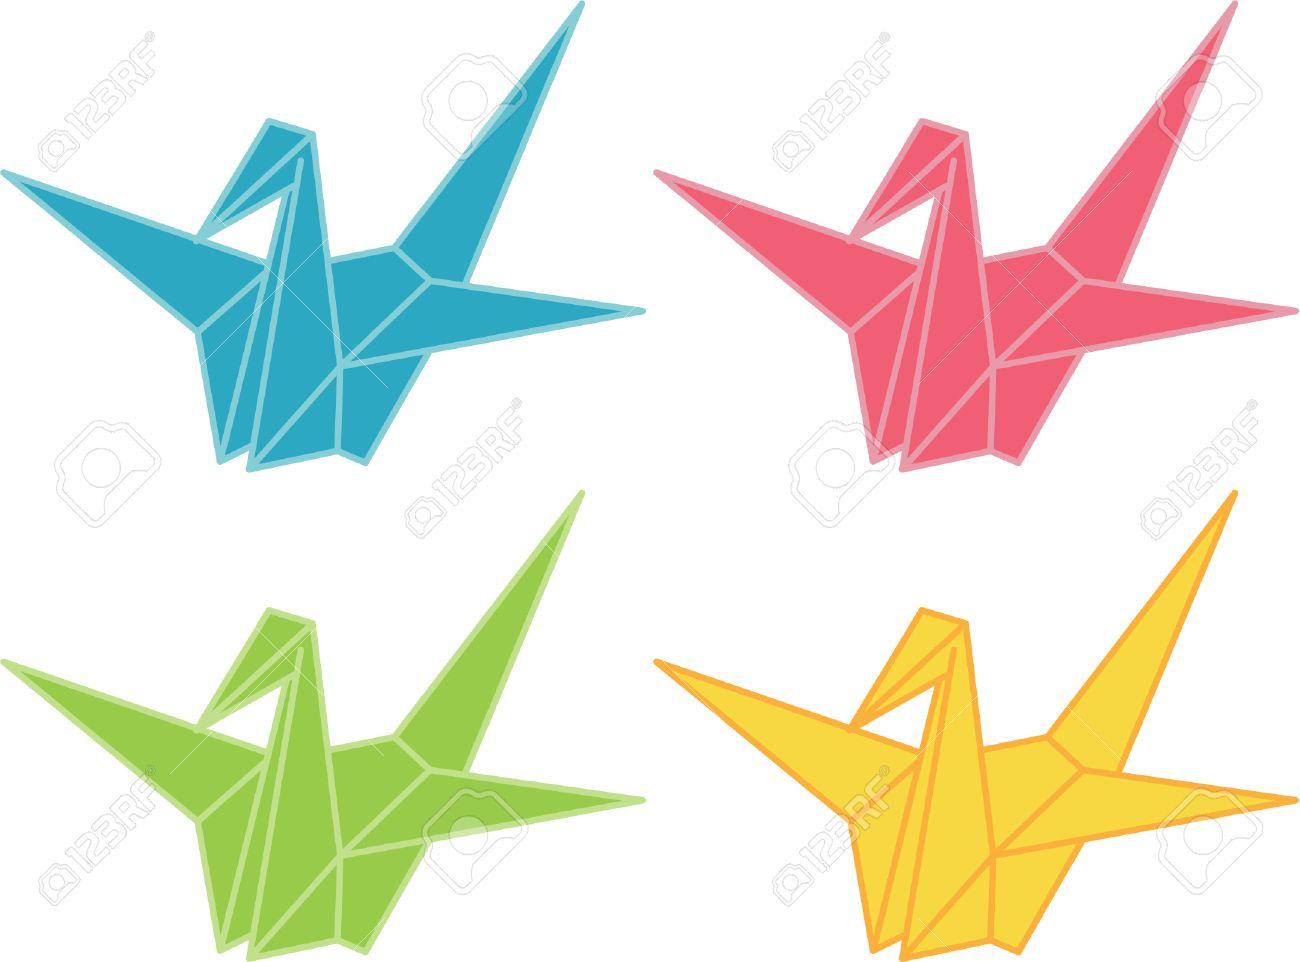 Origami Cranes Illustration Stock Vector